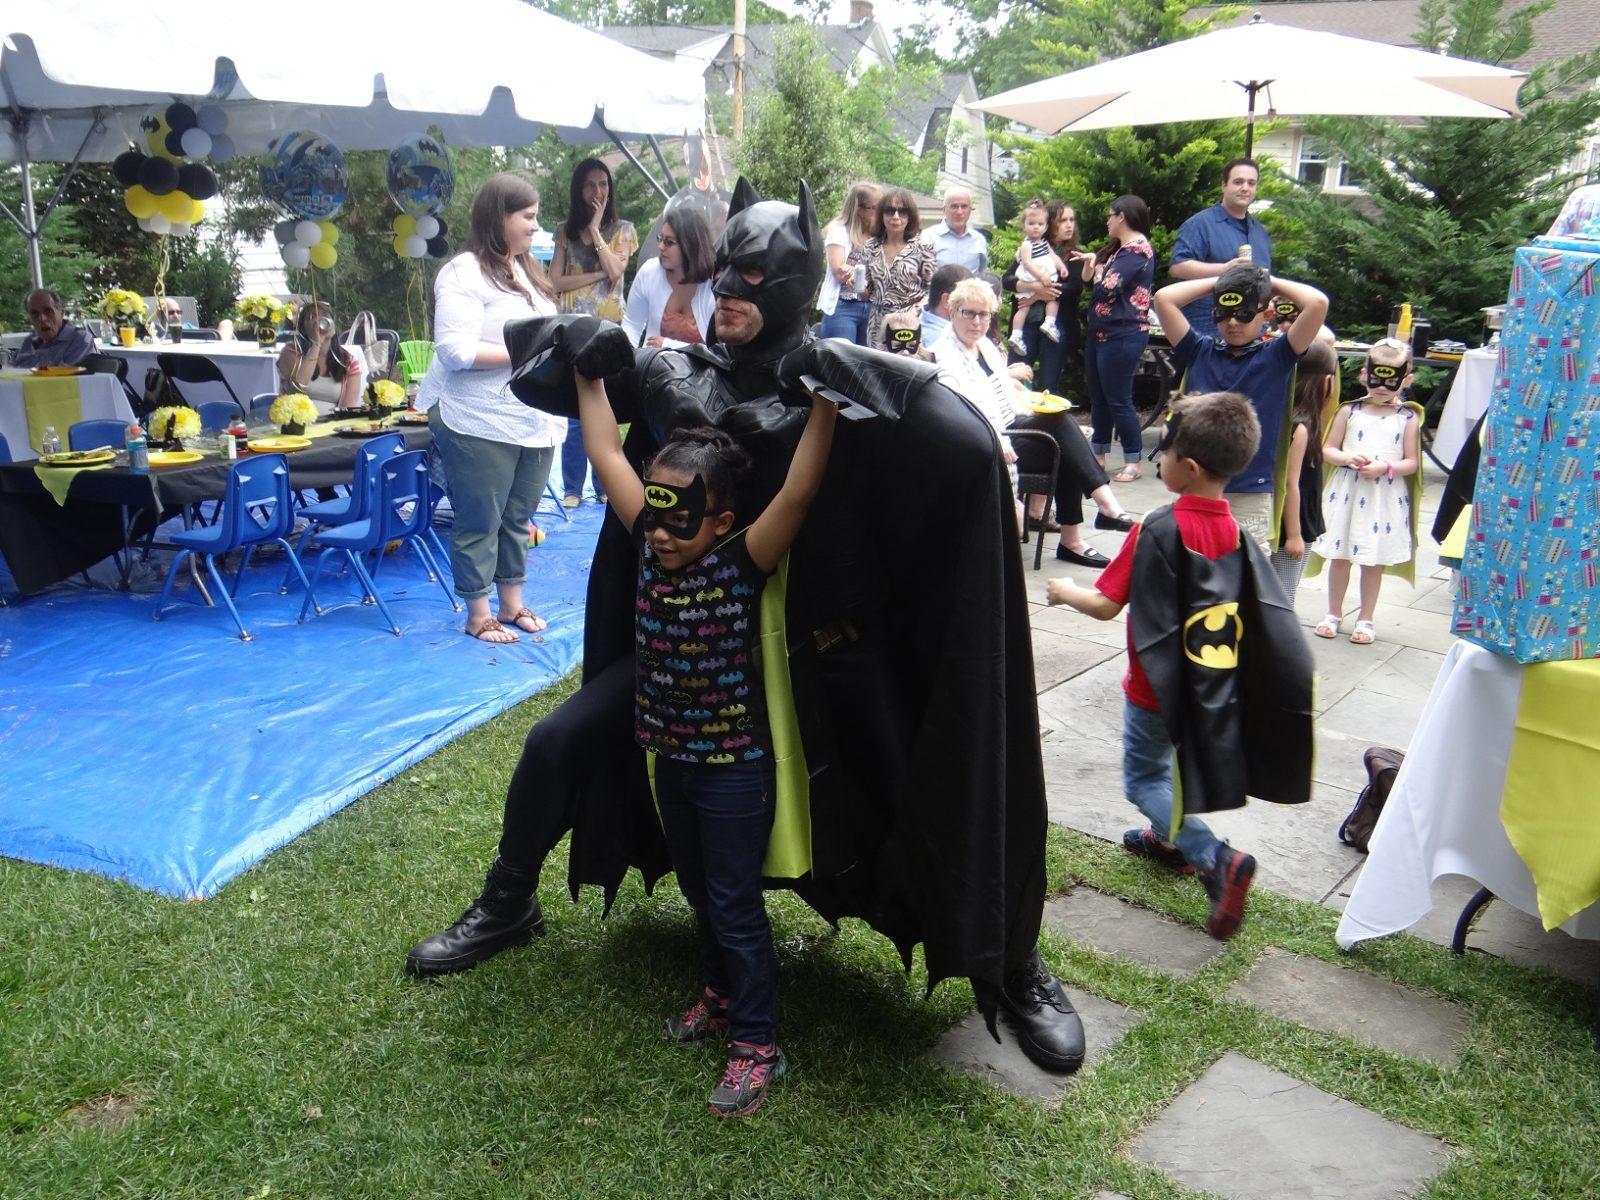 Batman super hero pose at birthday party